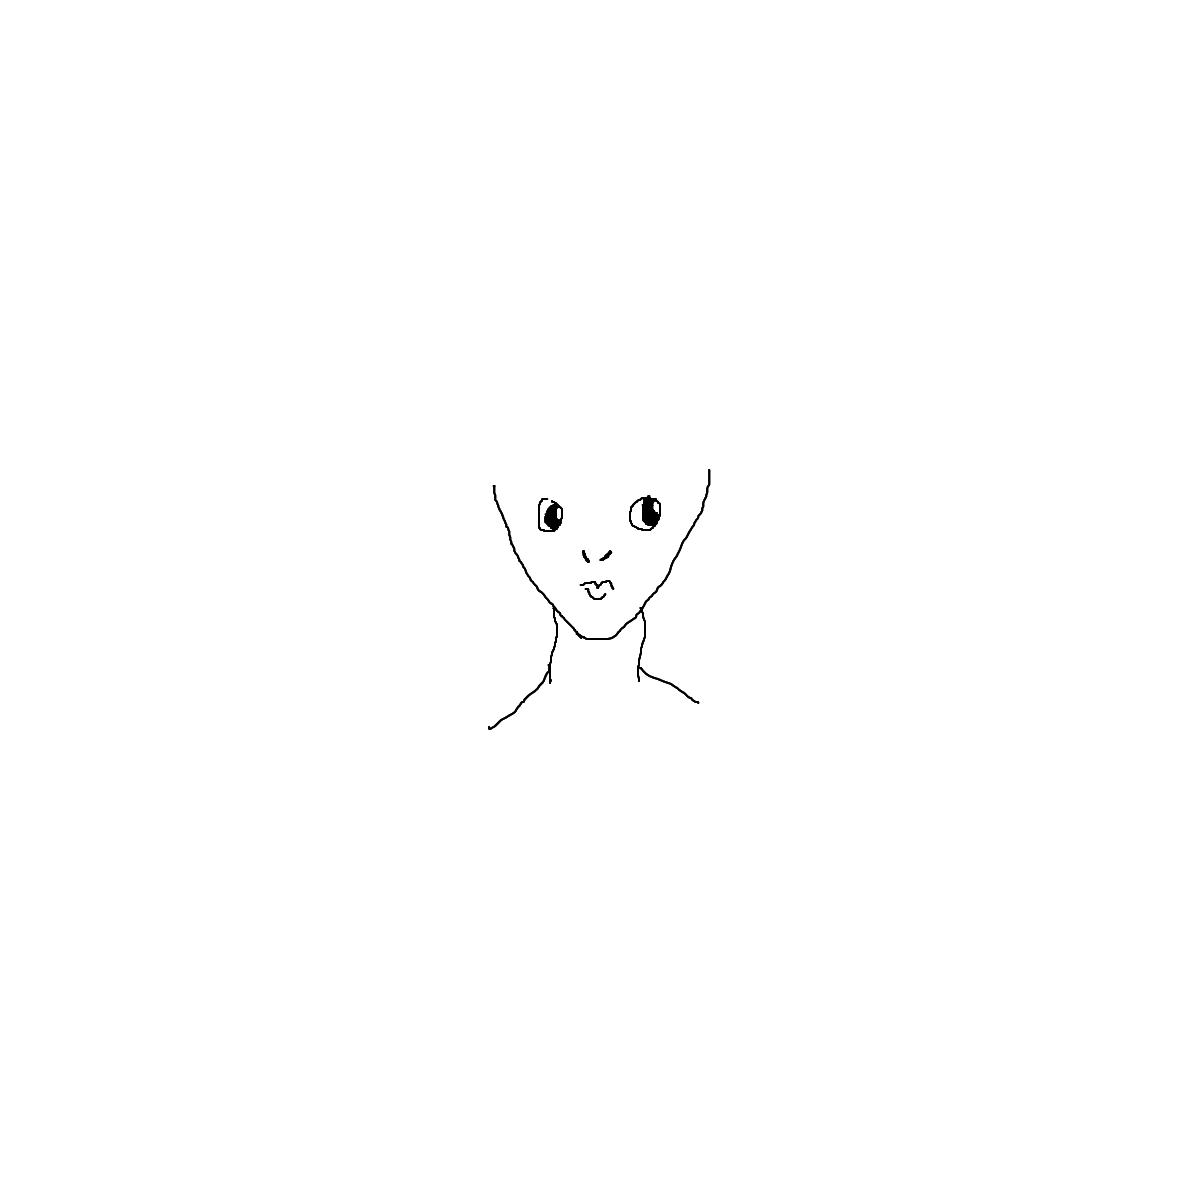 BAAAM drawing#23504 lat:52.3430366516113300lng: 4.7918910980224610